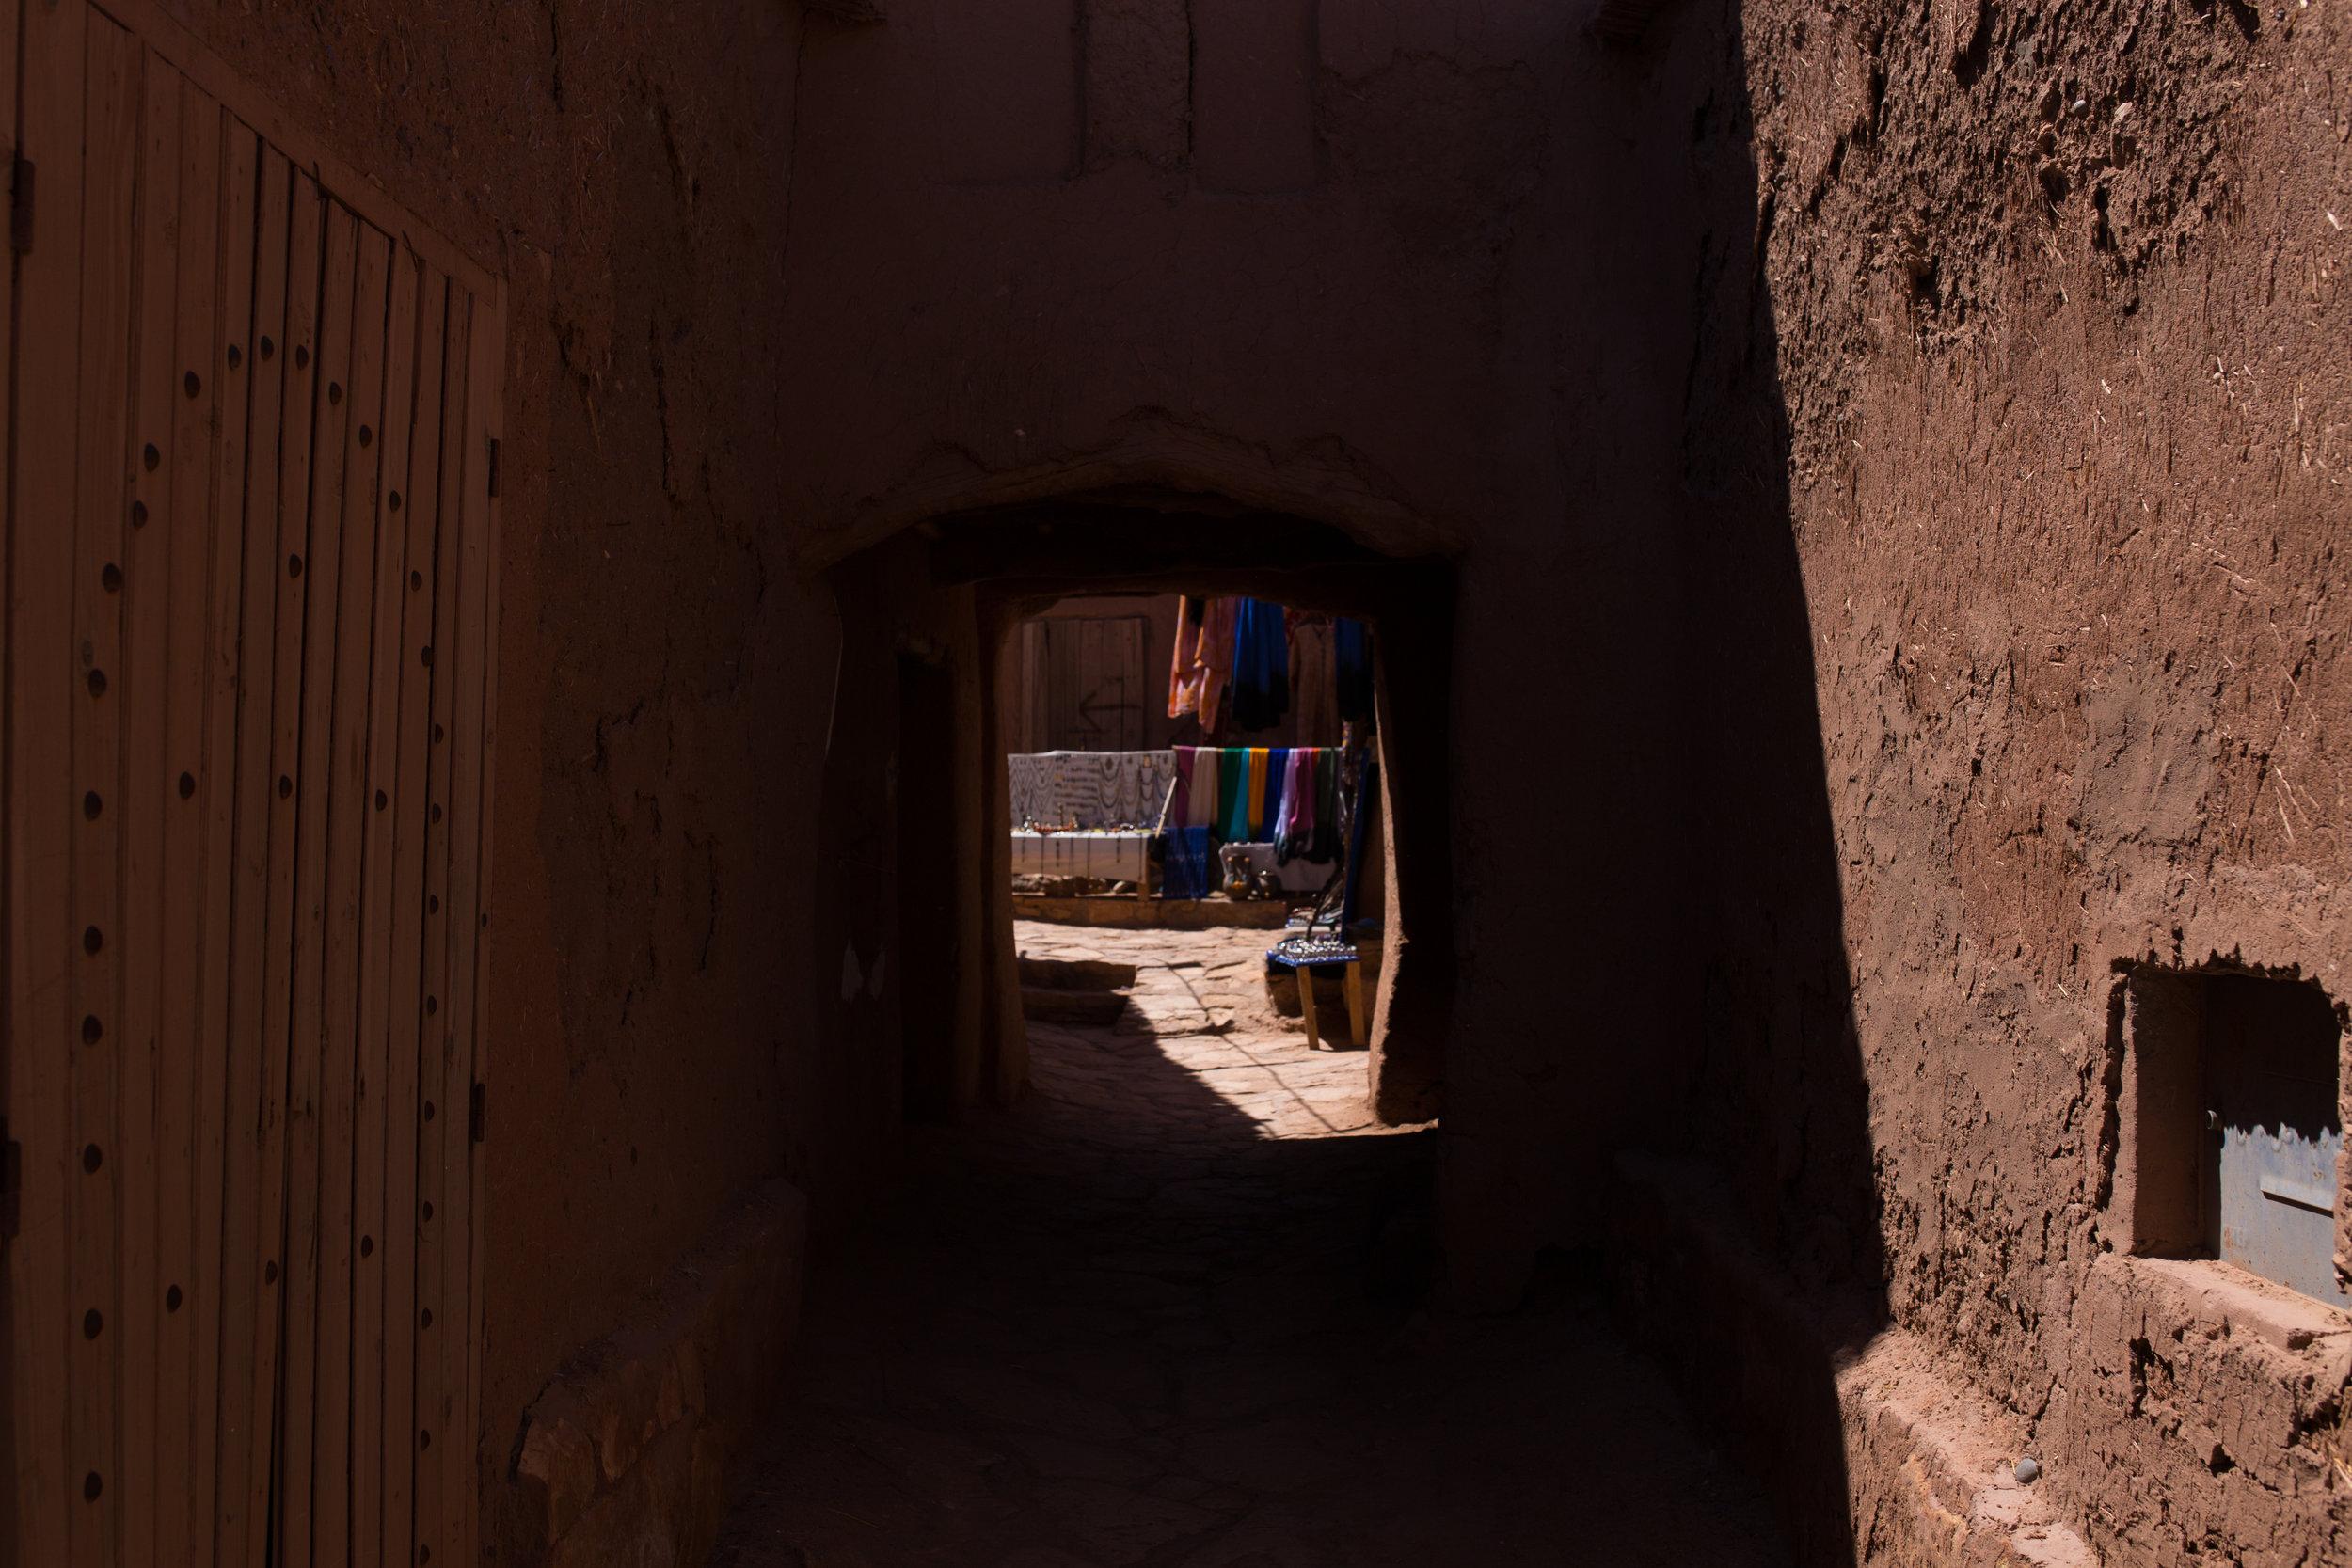 morocco-morocco travel-visit morocco-travel-travel photography-travel photographer-alina mendoza-alina mendoza photography-37.jpg